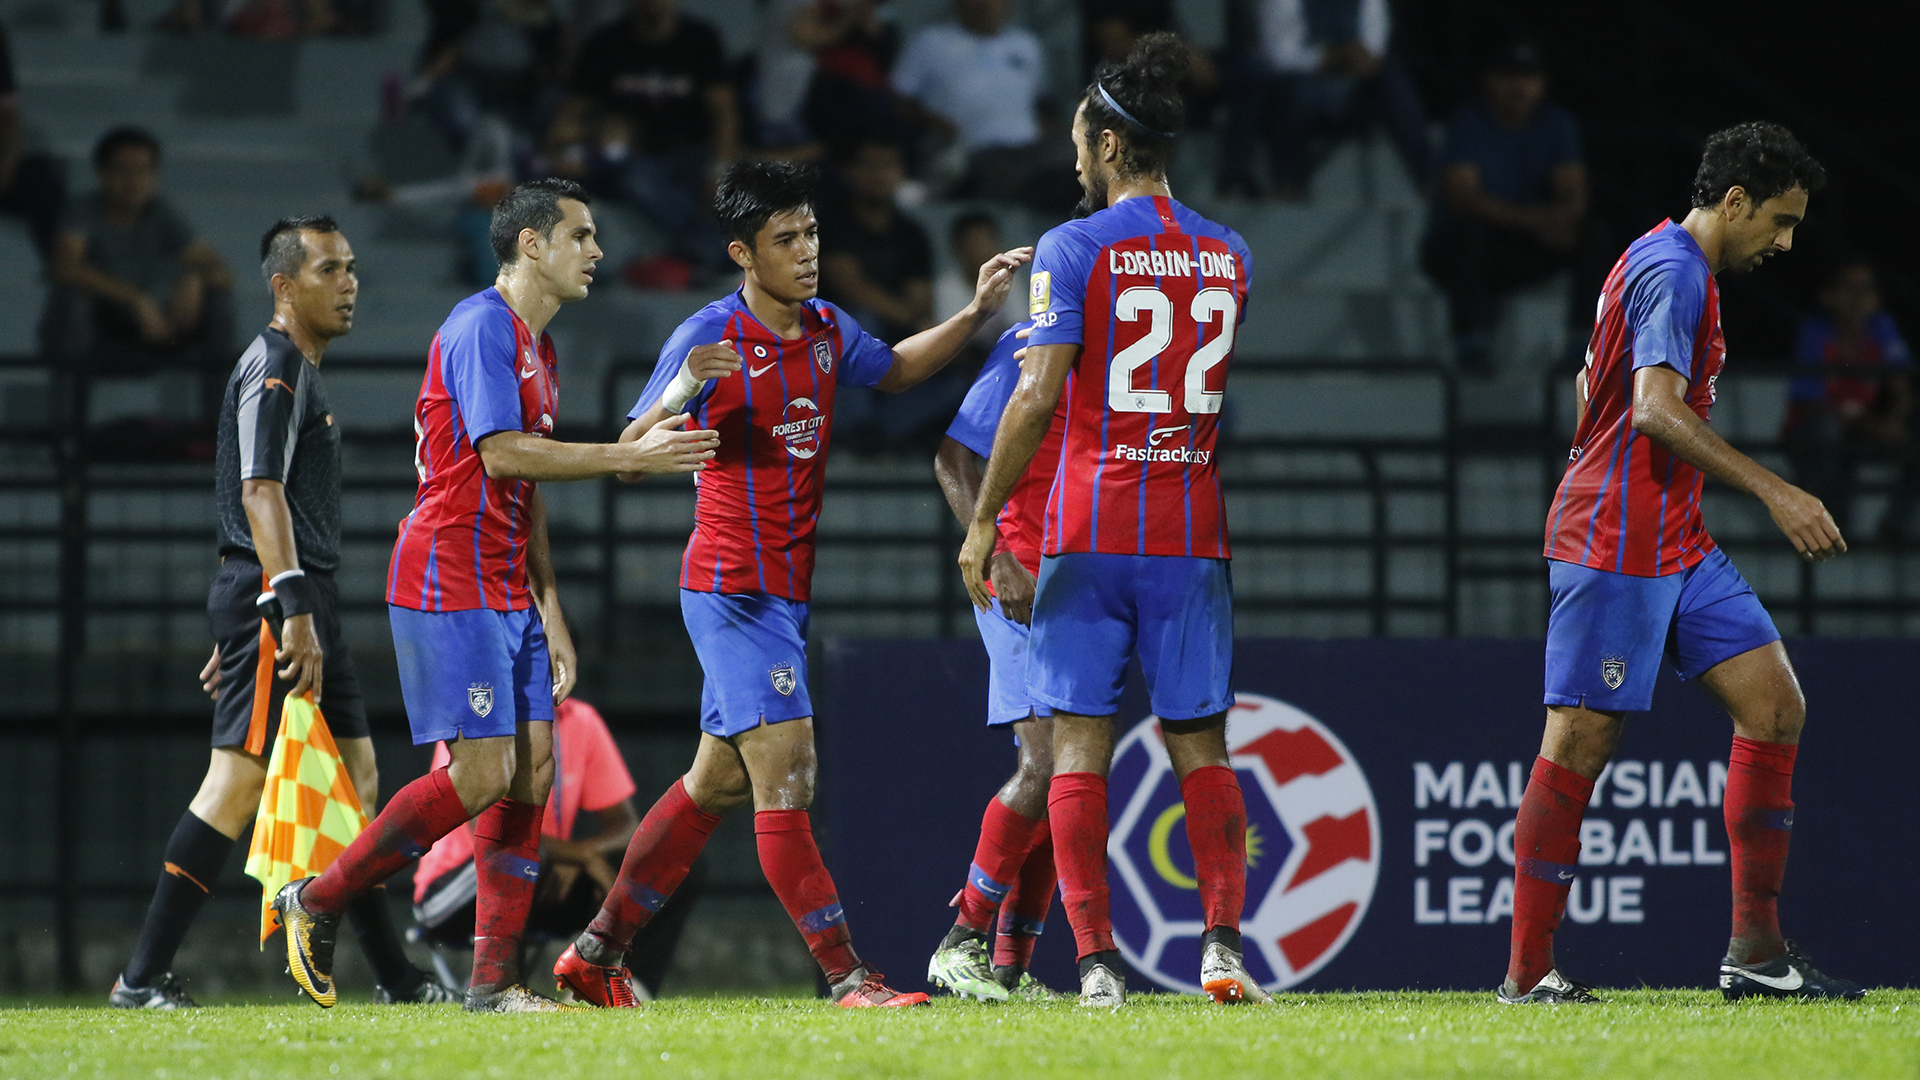 Syafiq Ahmad, PJ City FC v Johor Darul Ta'zim, Malaysia Super League, 13 Apr 2019